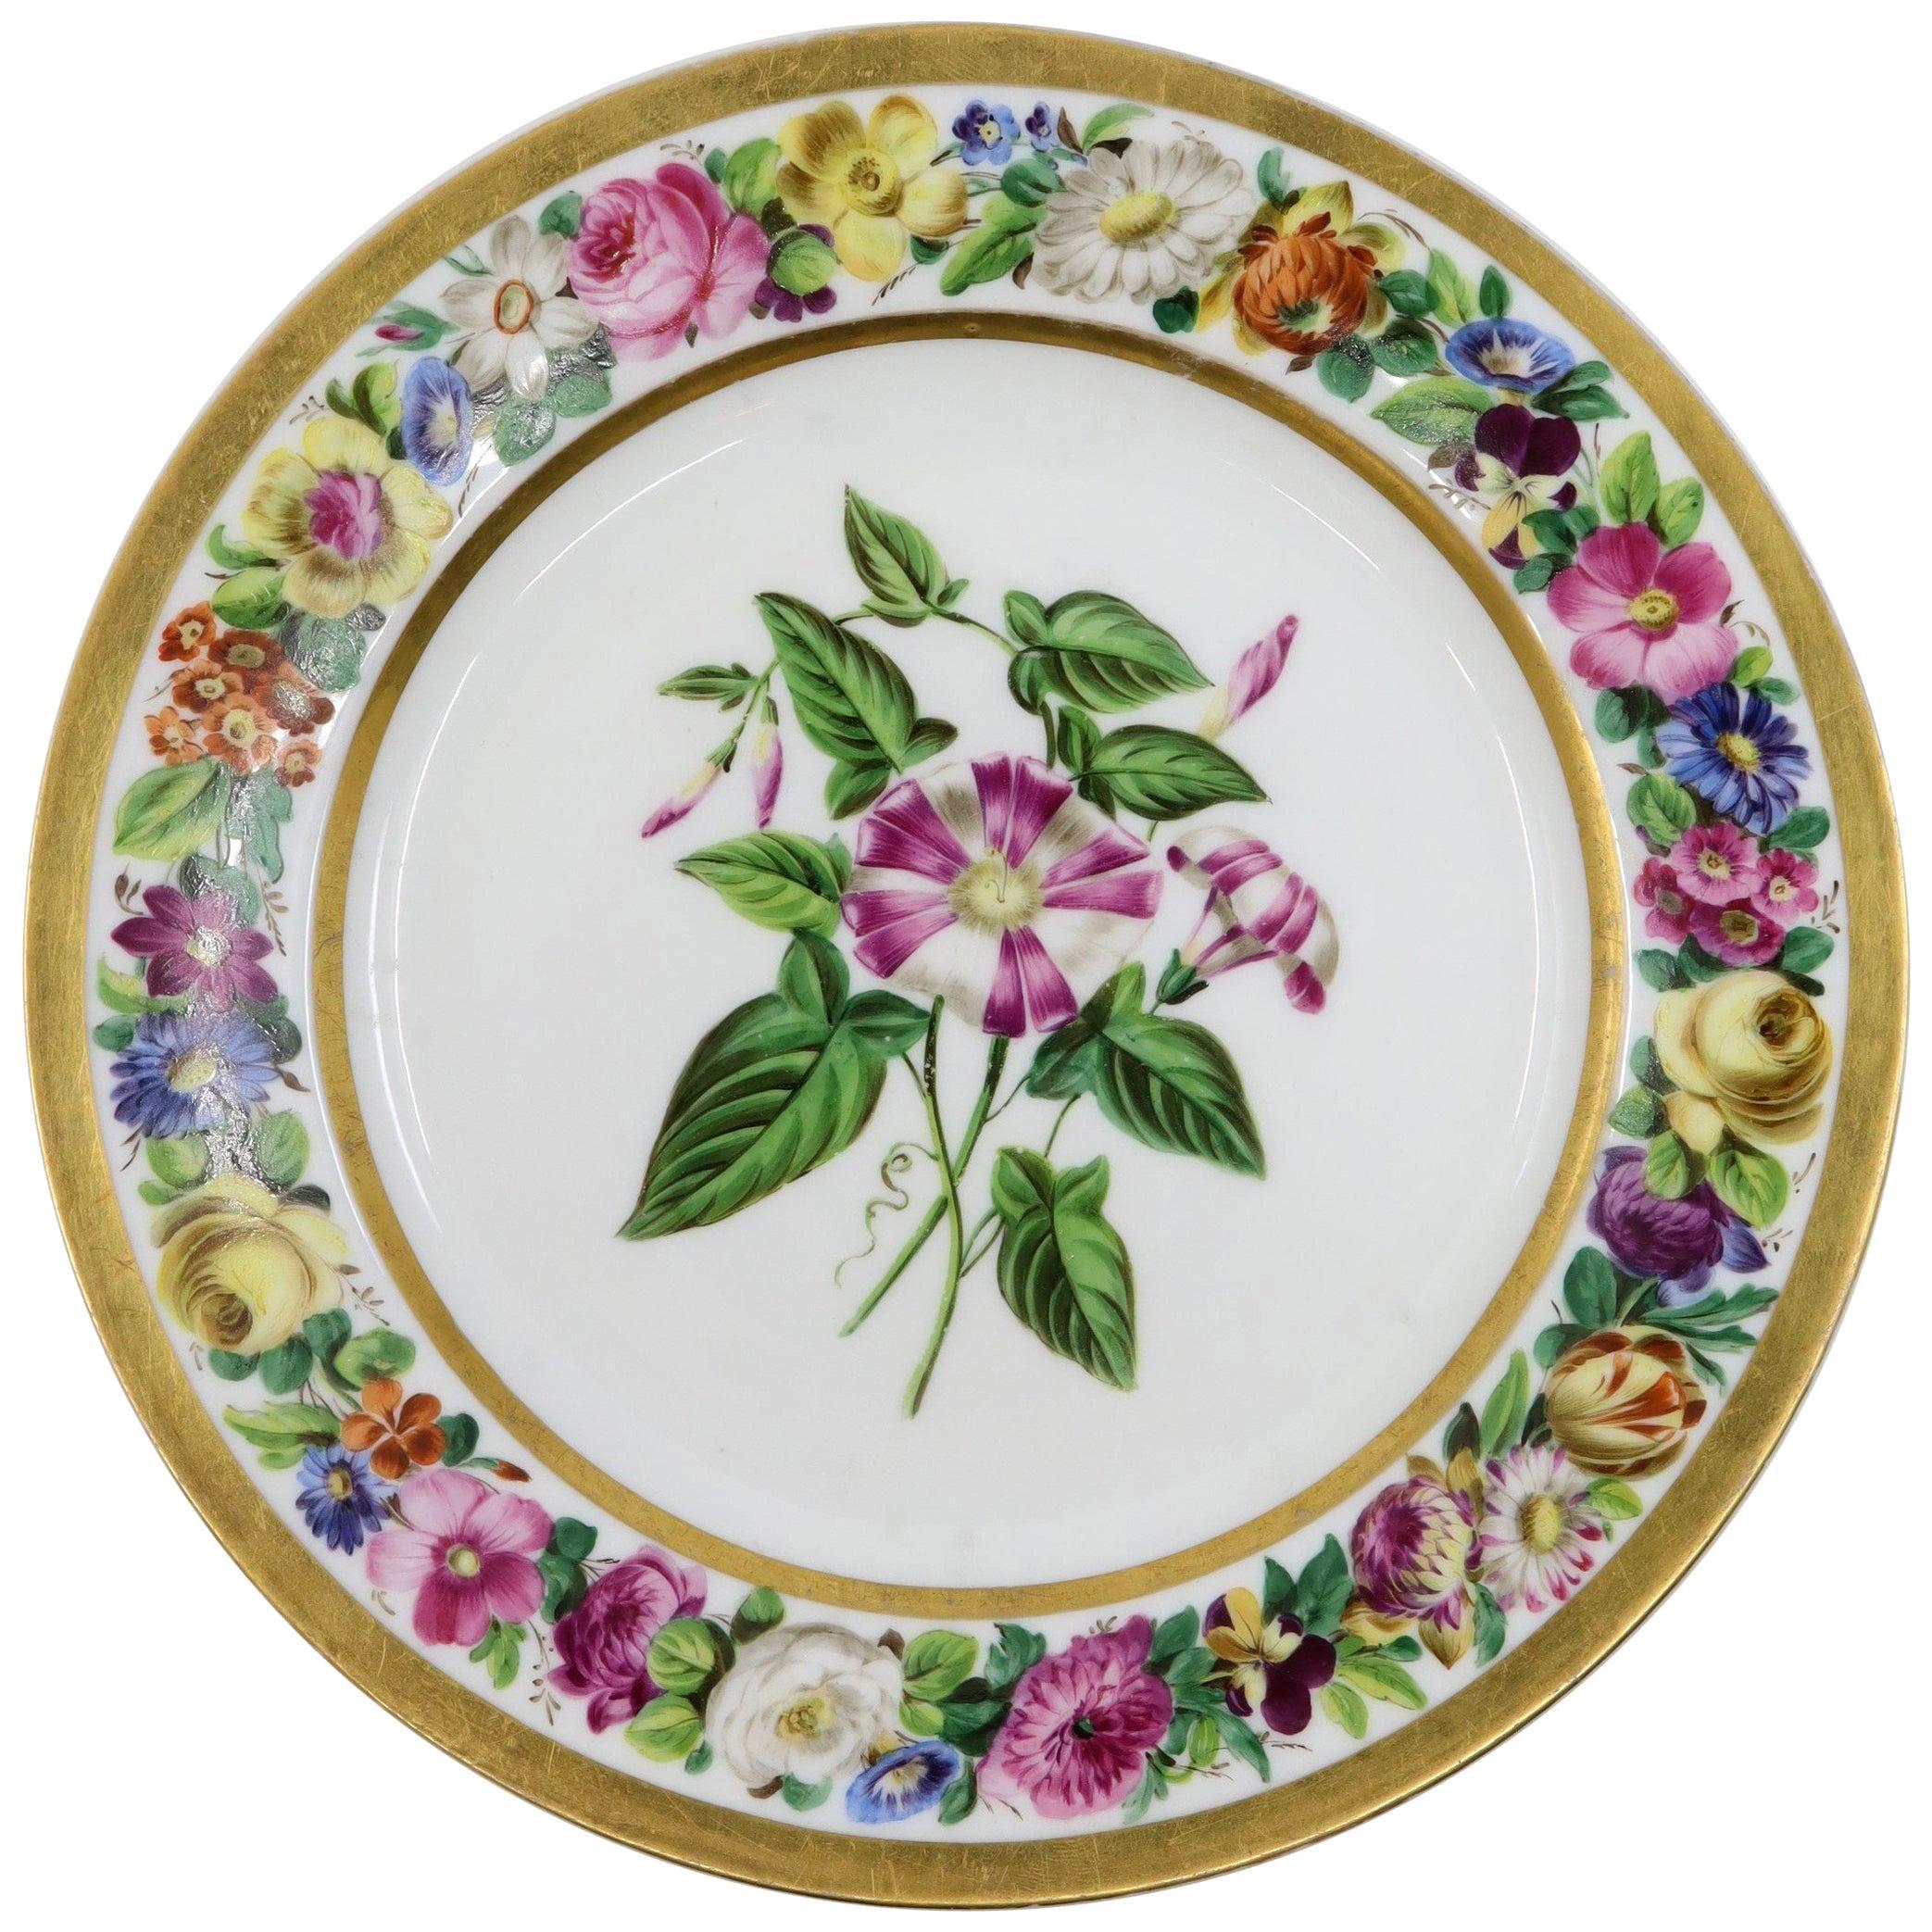 Paris Plate, 19th Century French Porcelain